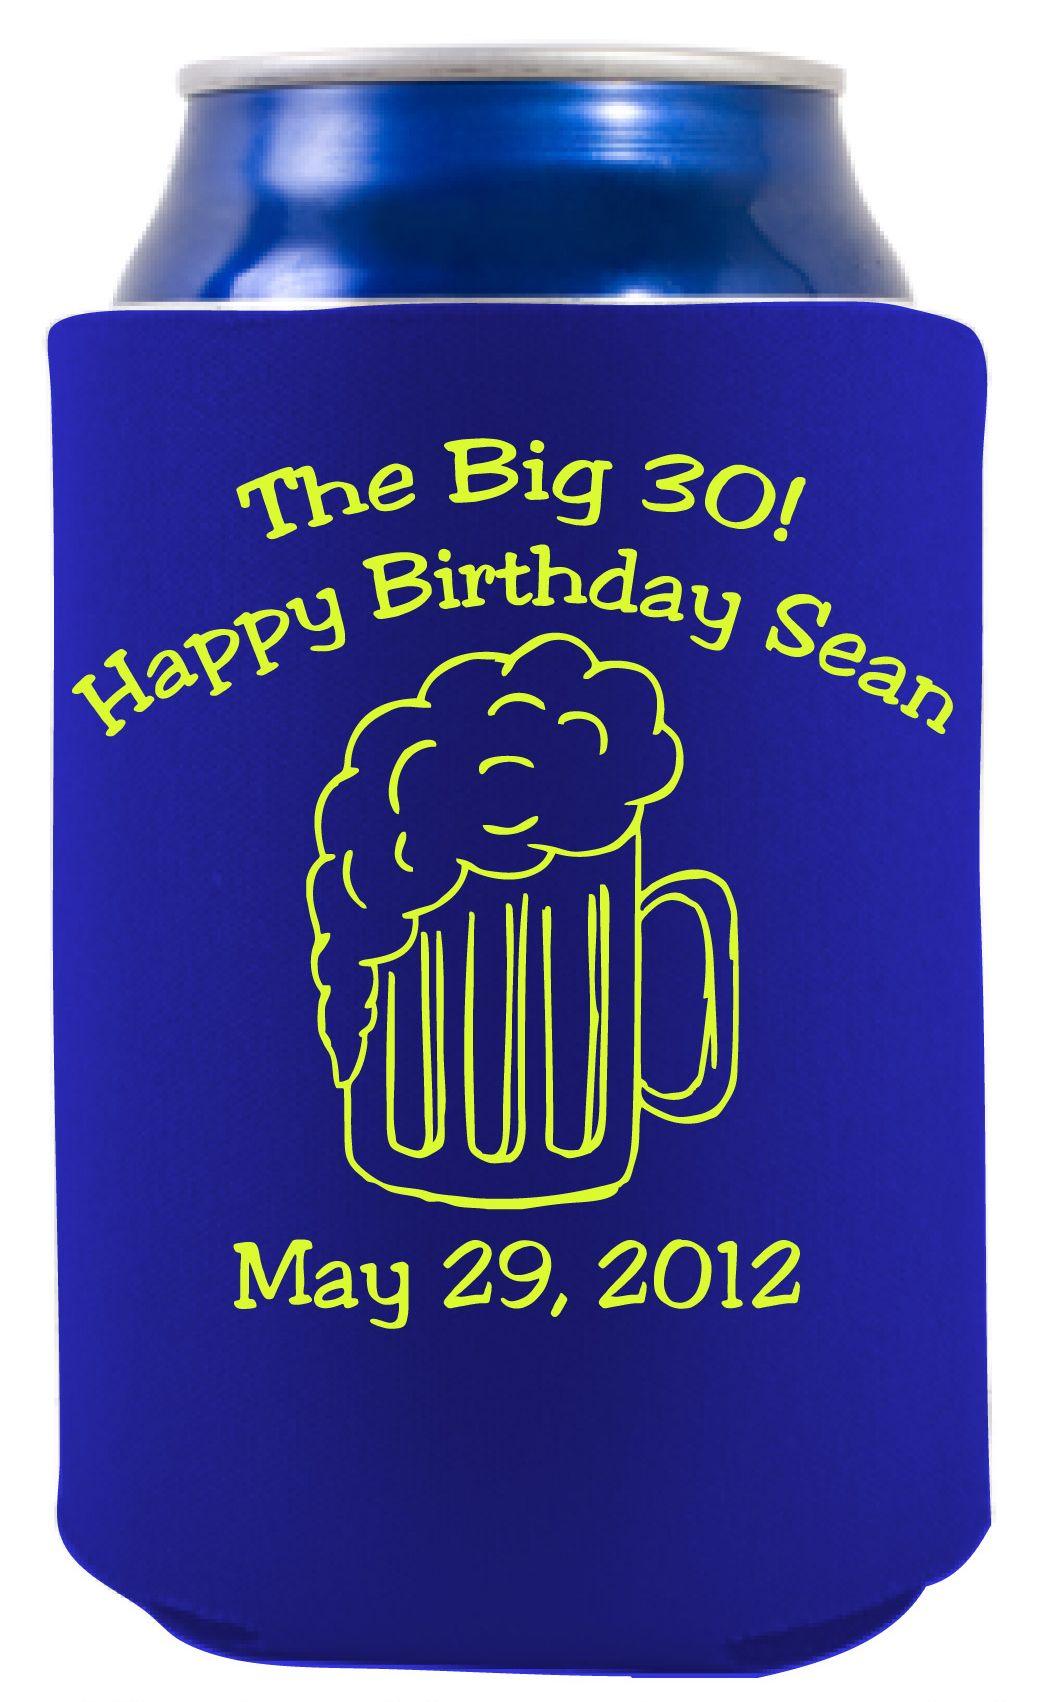 A big 30 clipart png royalty free The Big 30! Happy Birthday Sean! Love this! Beer mug clipart ... png royalty free